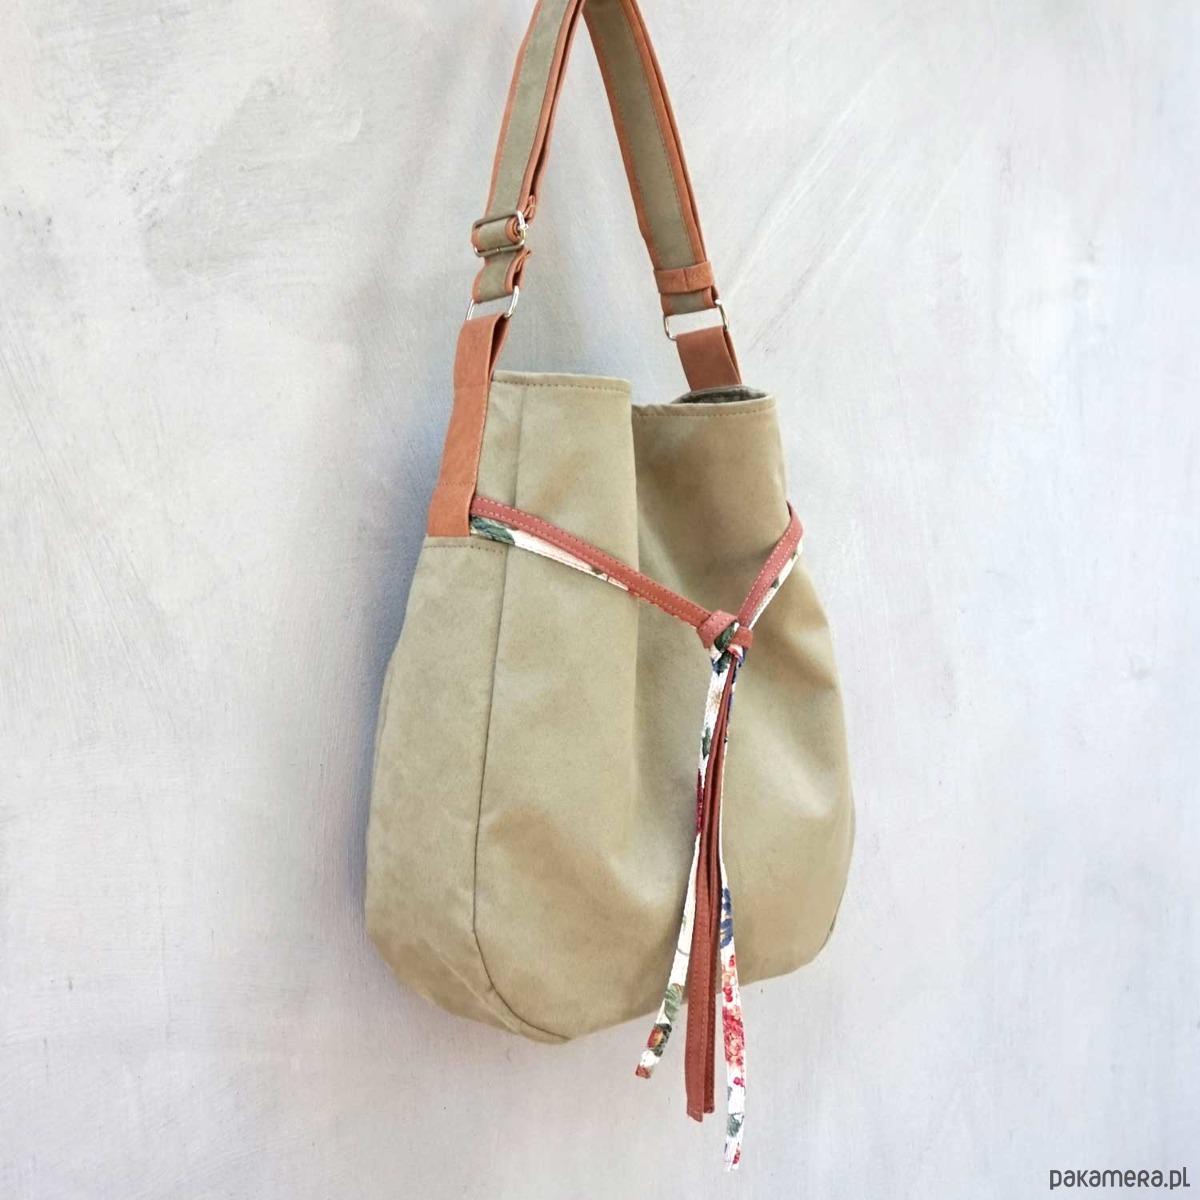 c6fba99316264 SIMPLY BAG - duża torba worek - oliwka - torby na ramię - damskie -  Pakamera.pl